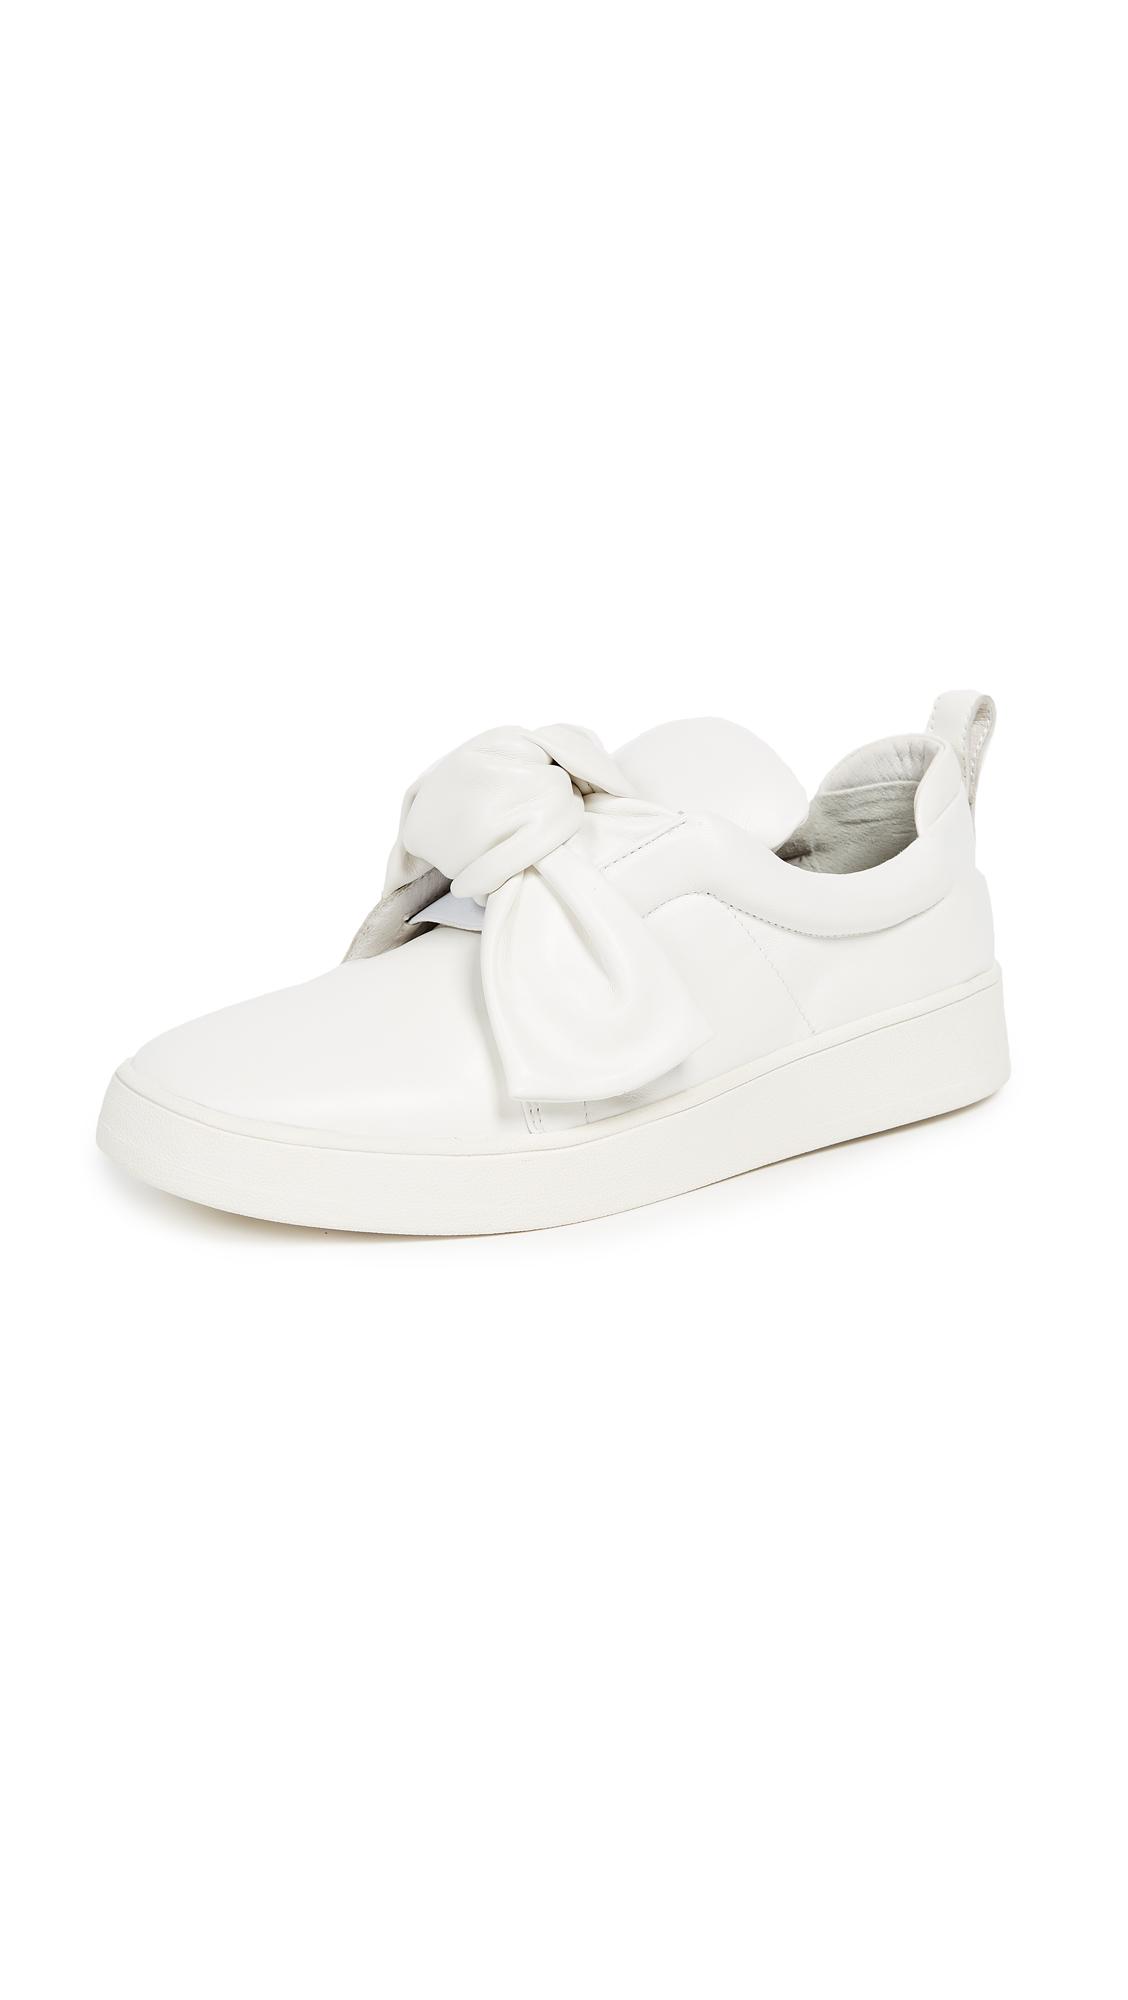 Sol Sana Mike Slip On Sneakers - White